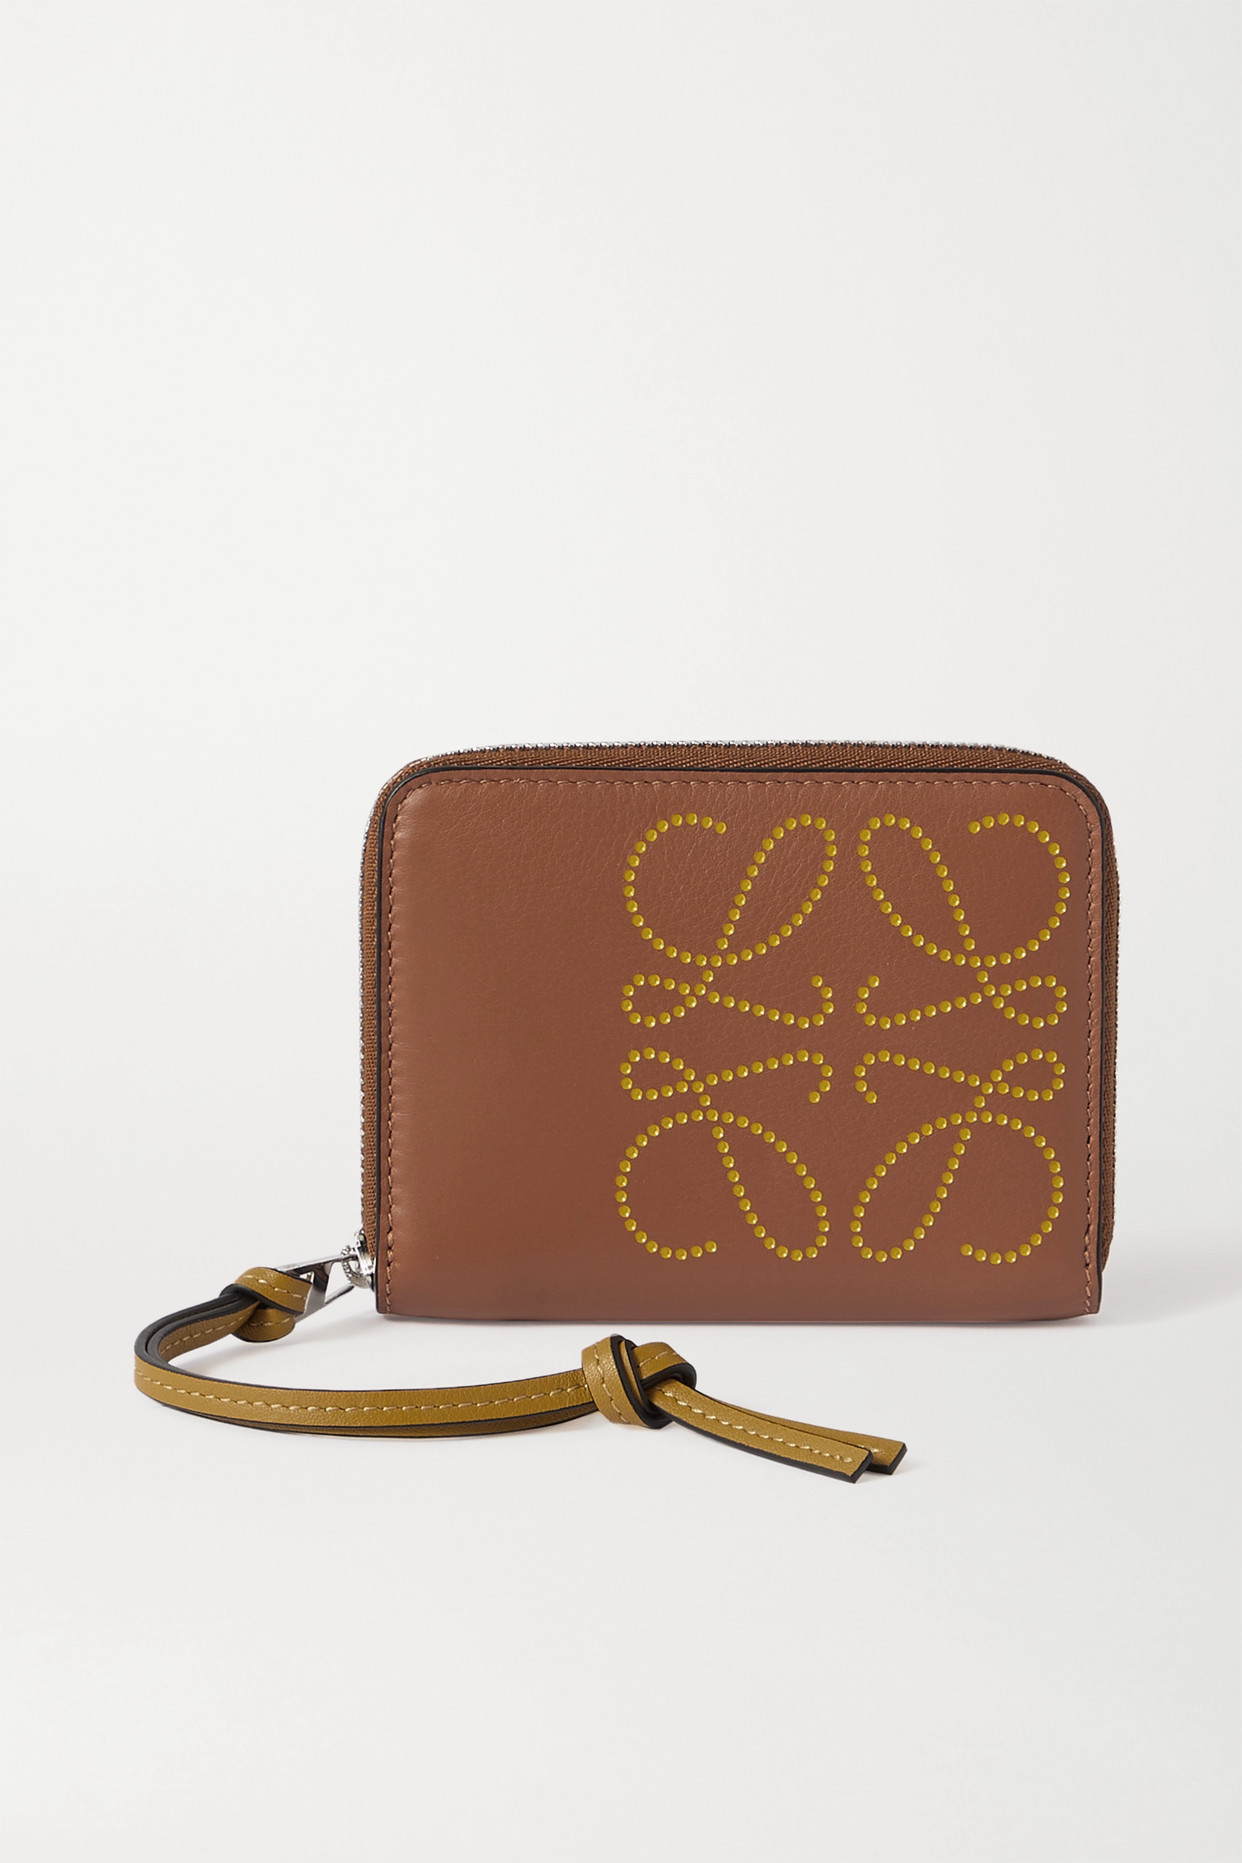 LOEWE - Embossed Leather Wallet - Brown - one size